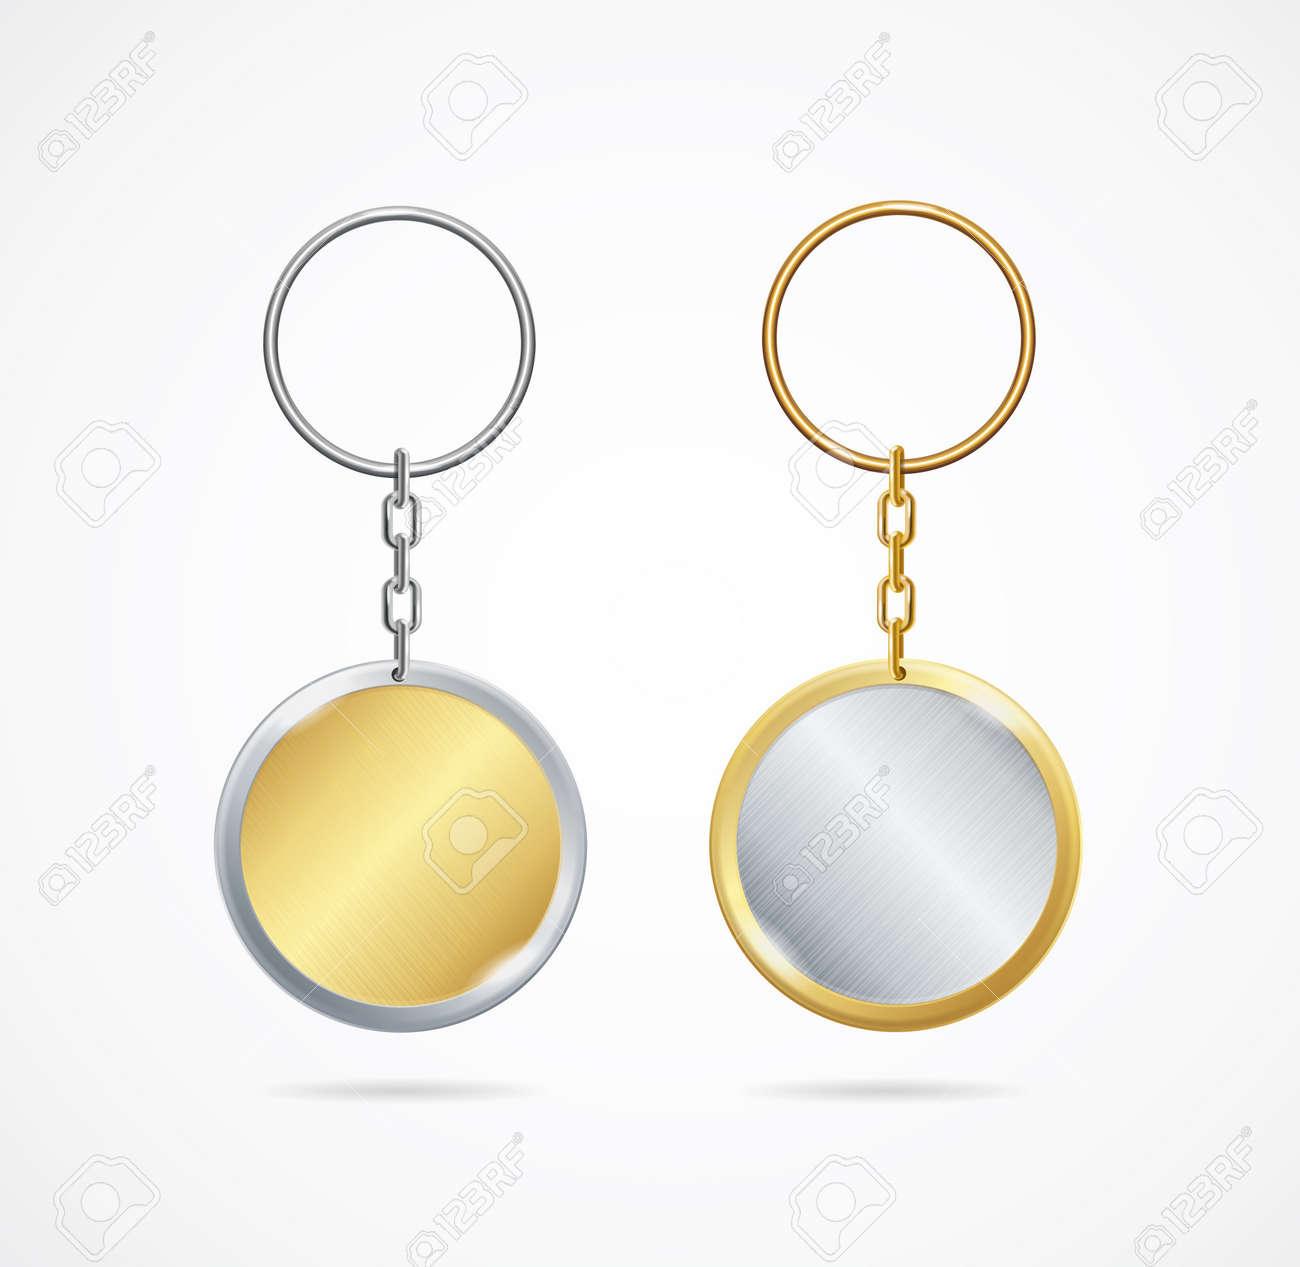 Realistic Detailed 3d Empty Metallic Keychain Set. Vector - 169550587